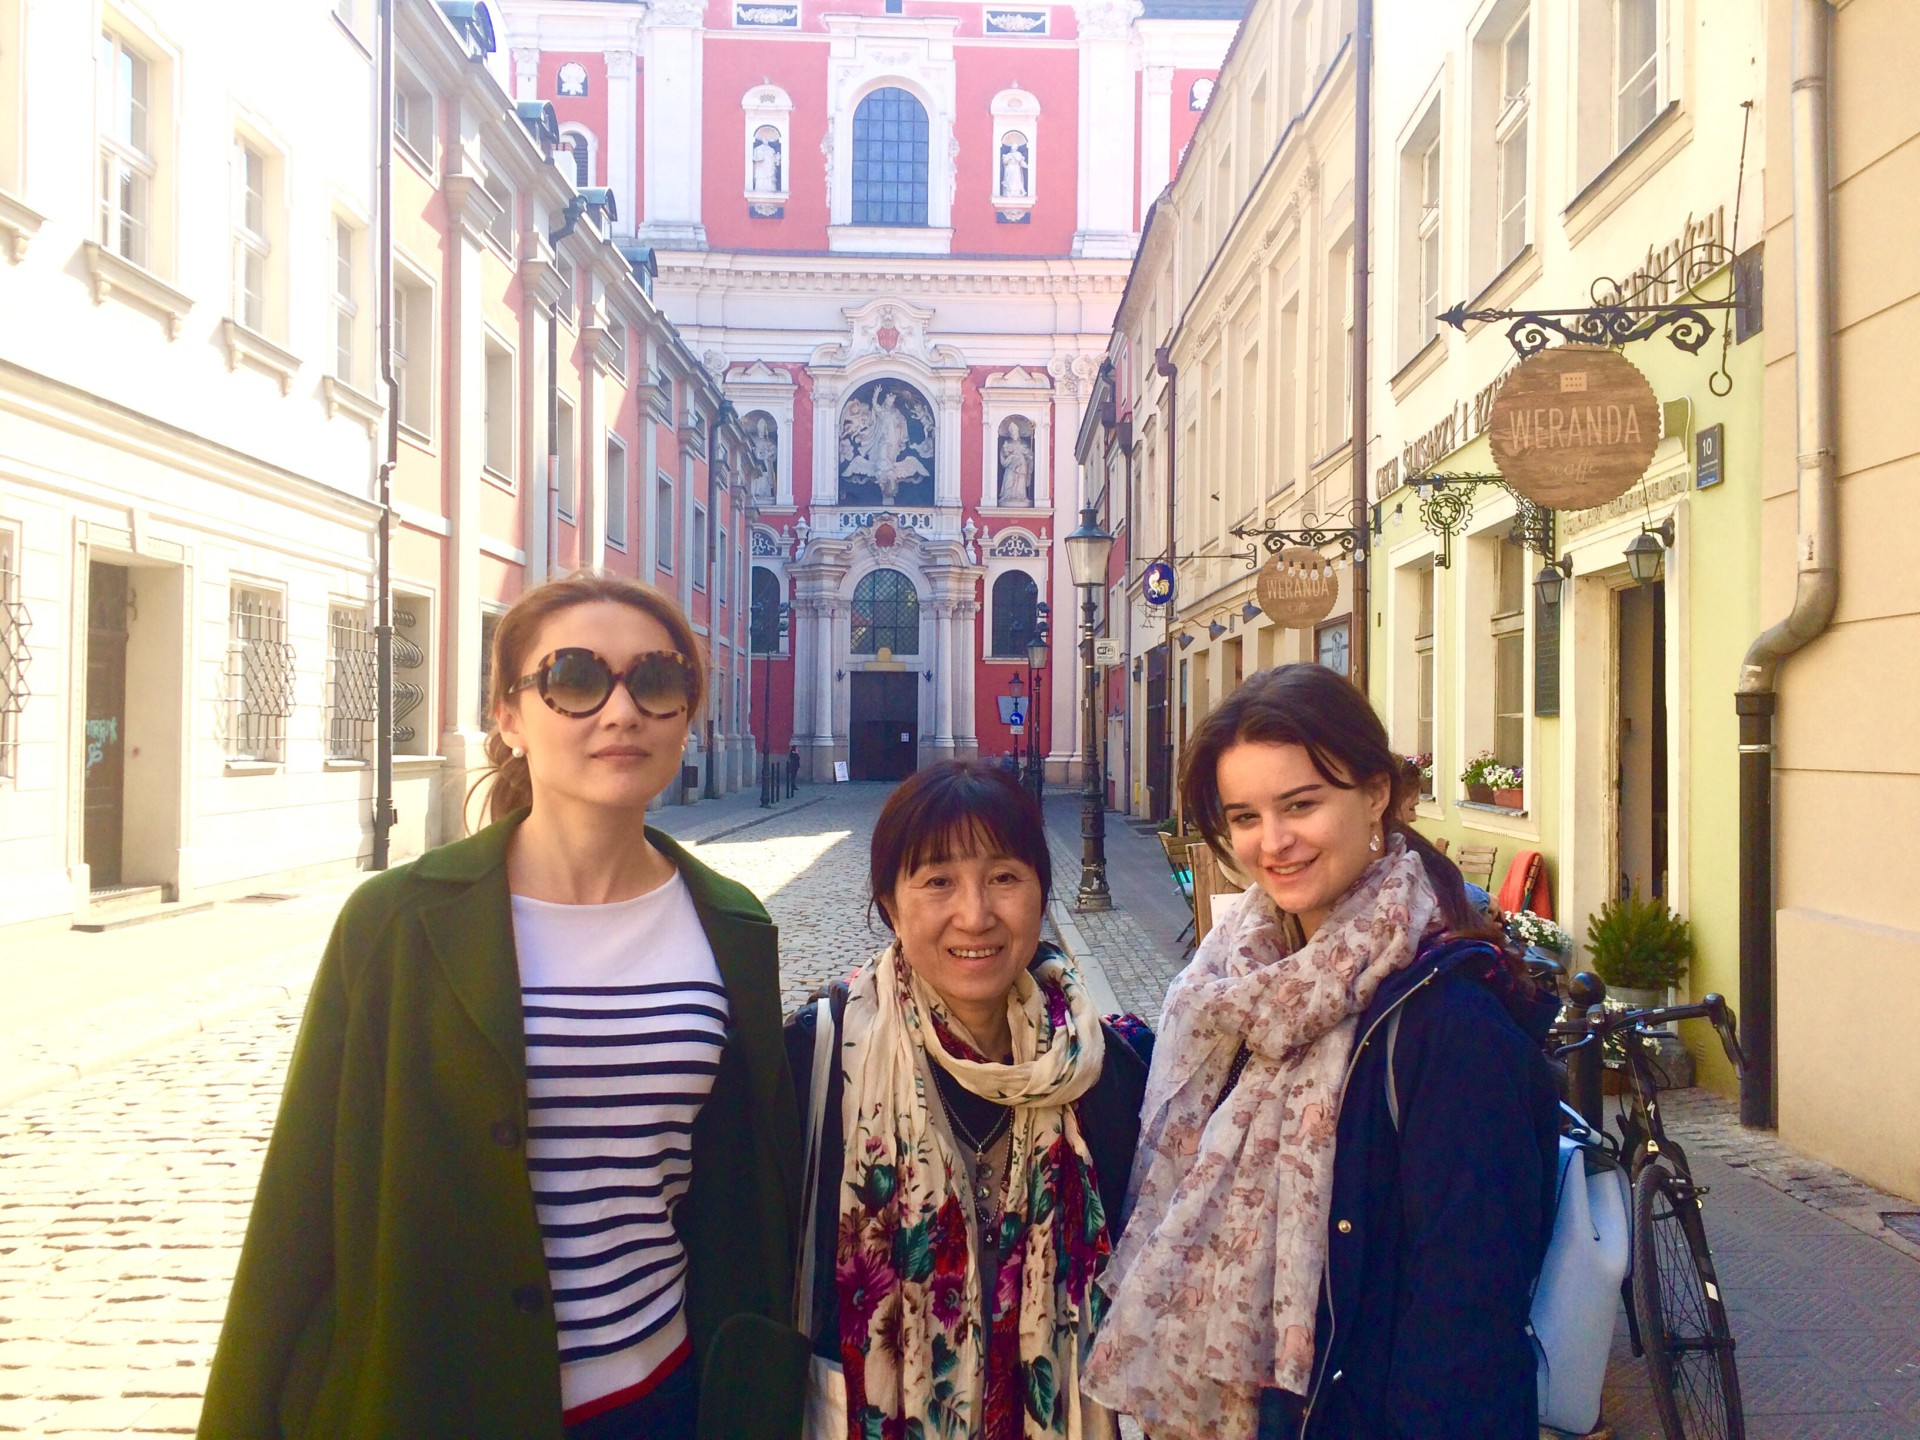 Composer students Tatyana, Atsuko and Hristina